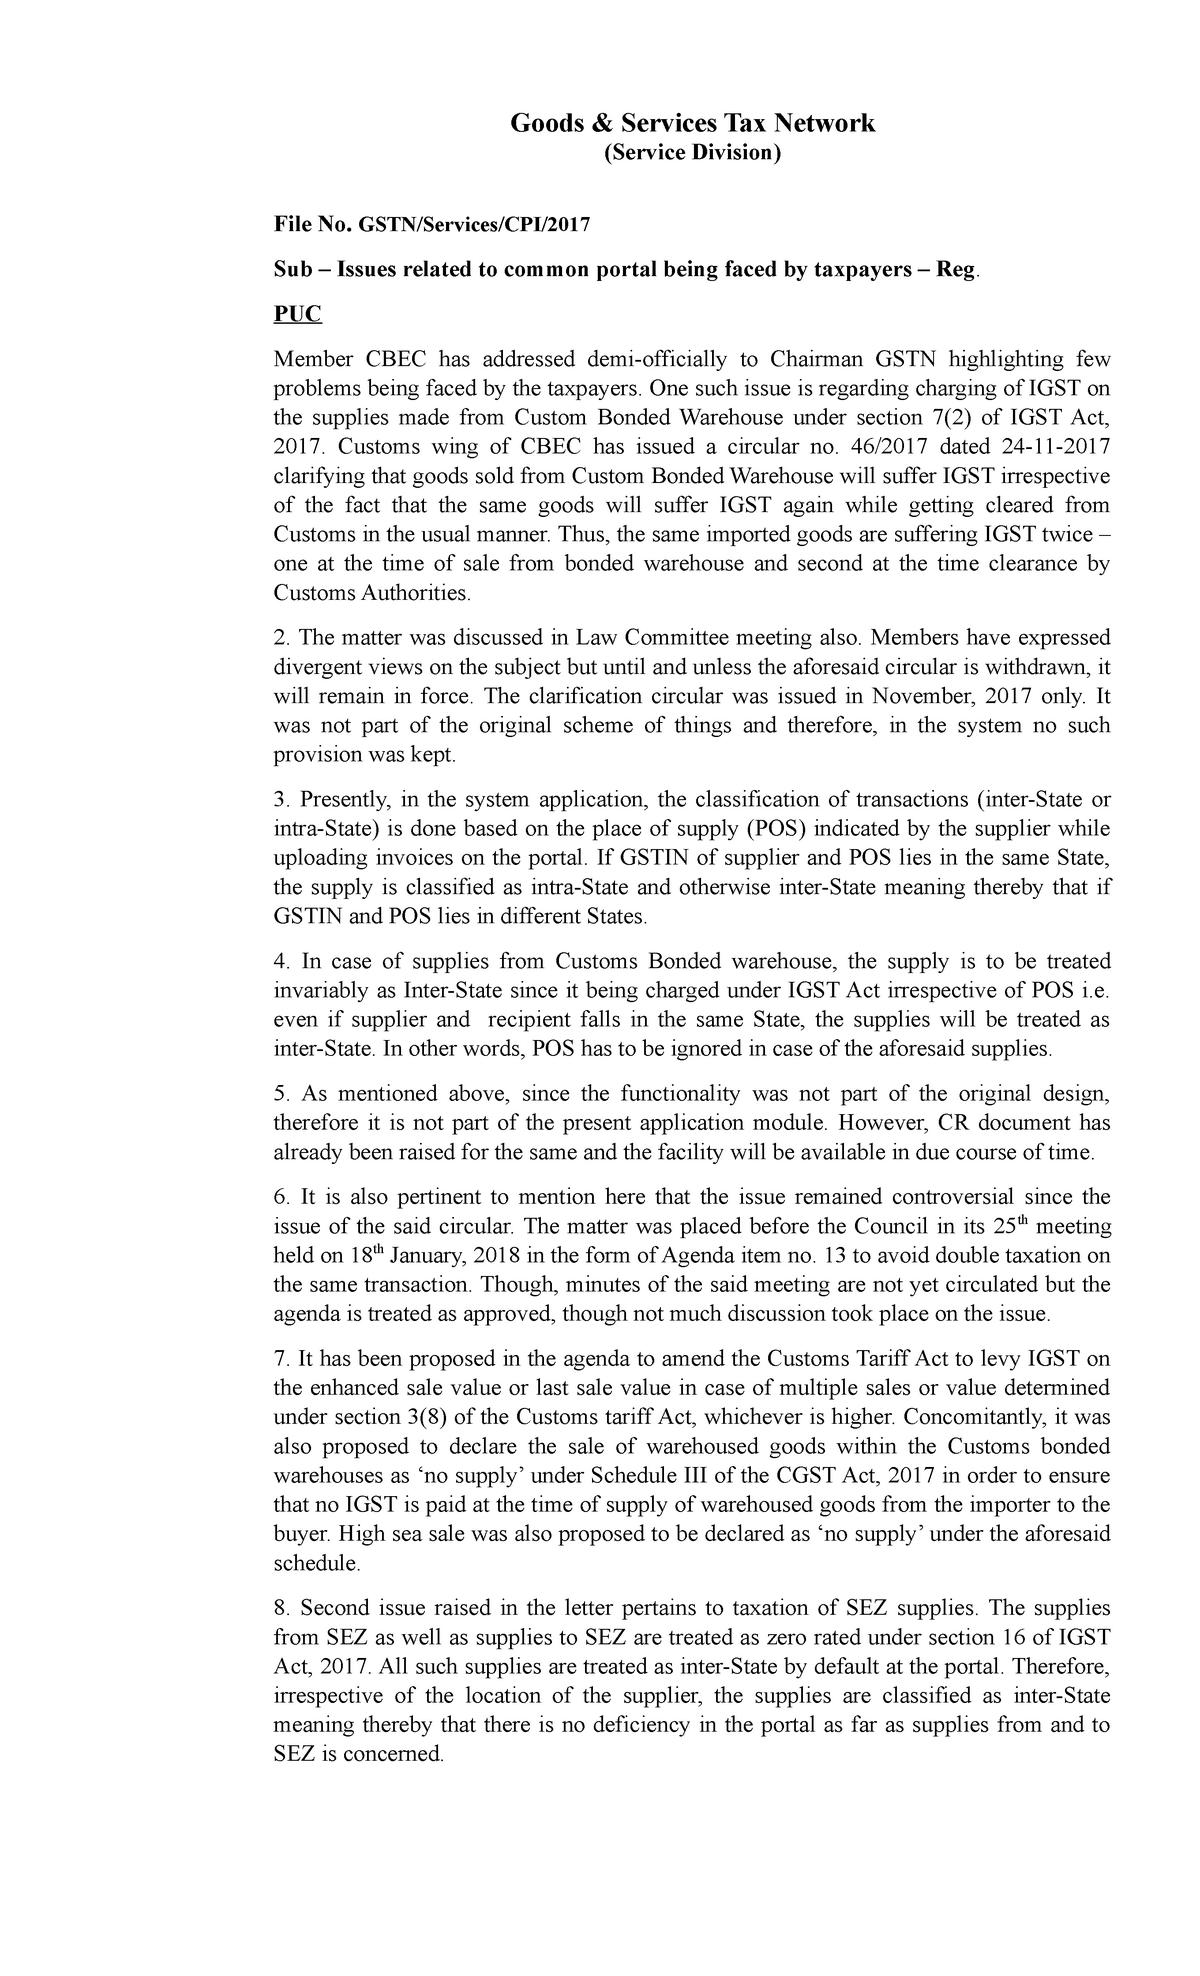 Replies Notes - 1 - SIXSIGMA101: Six Sigma - StuDocu